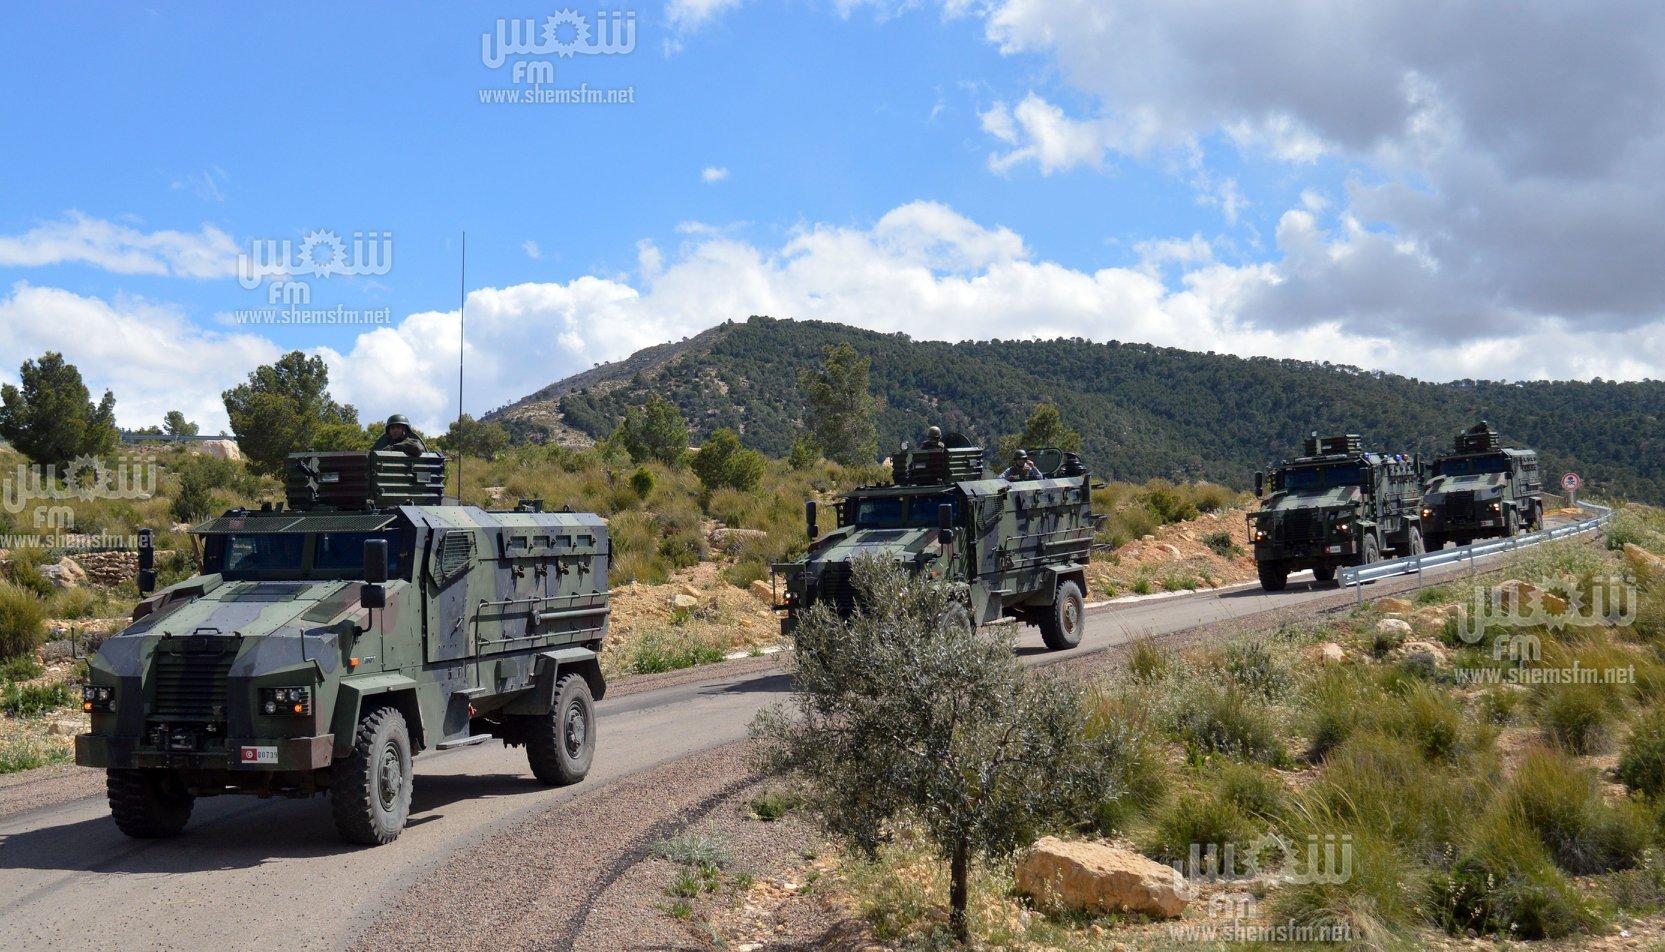 Armée Tunisienne / Tunisian Armed Forces / القوات المسلحة التونسية - Page 16 56742479-2444555198899084-8746083385086050304-o